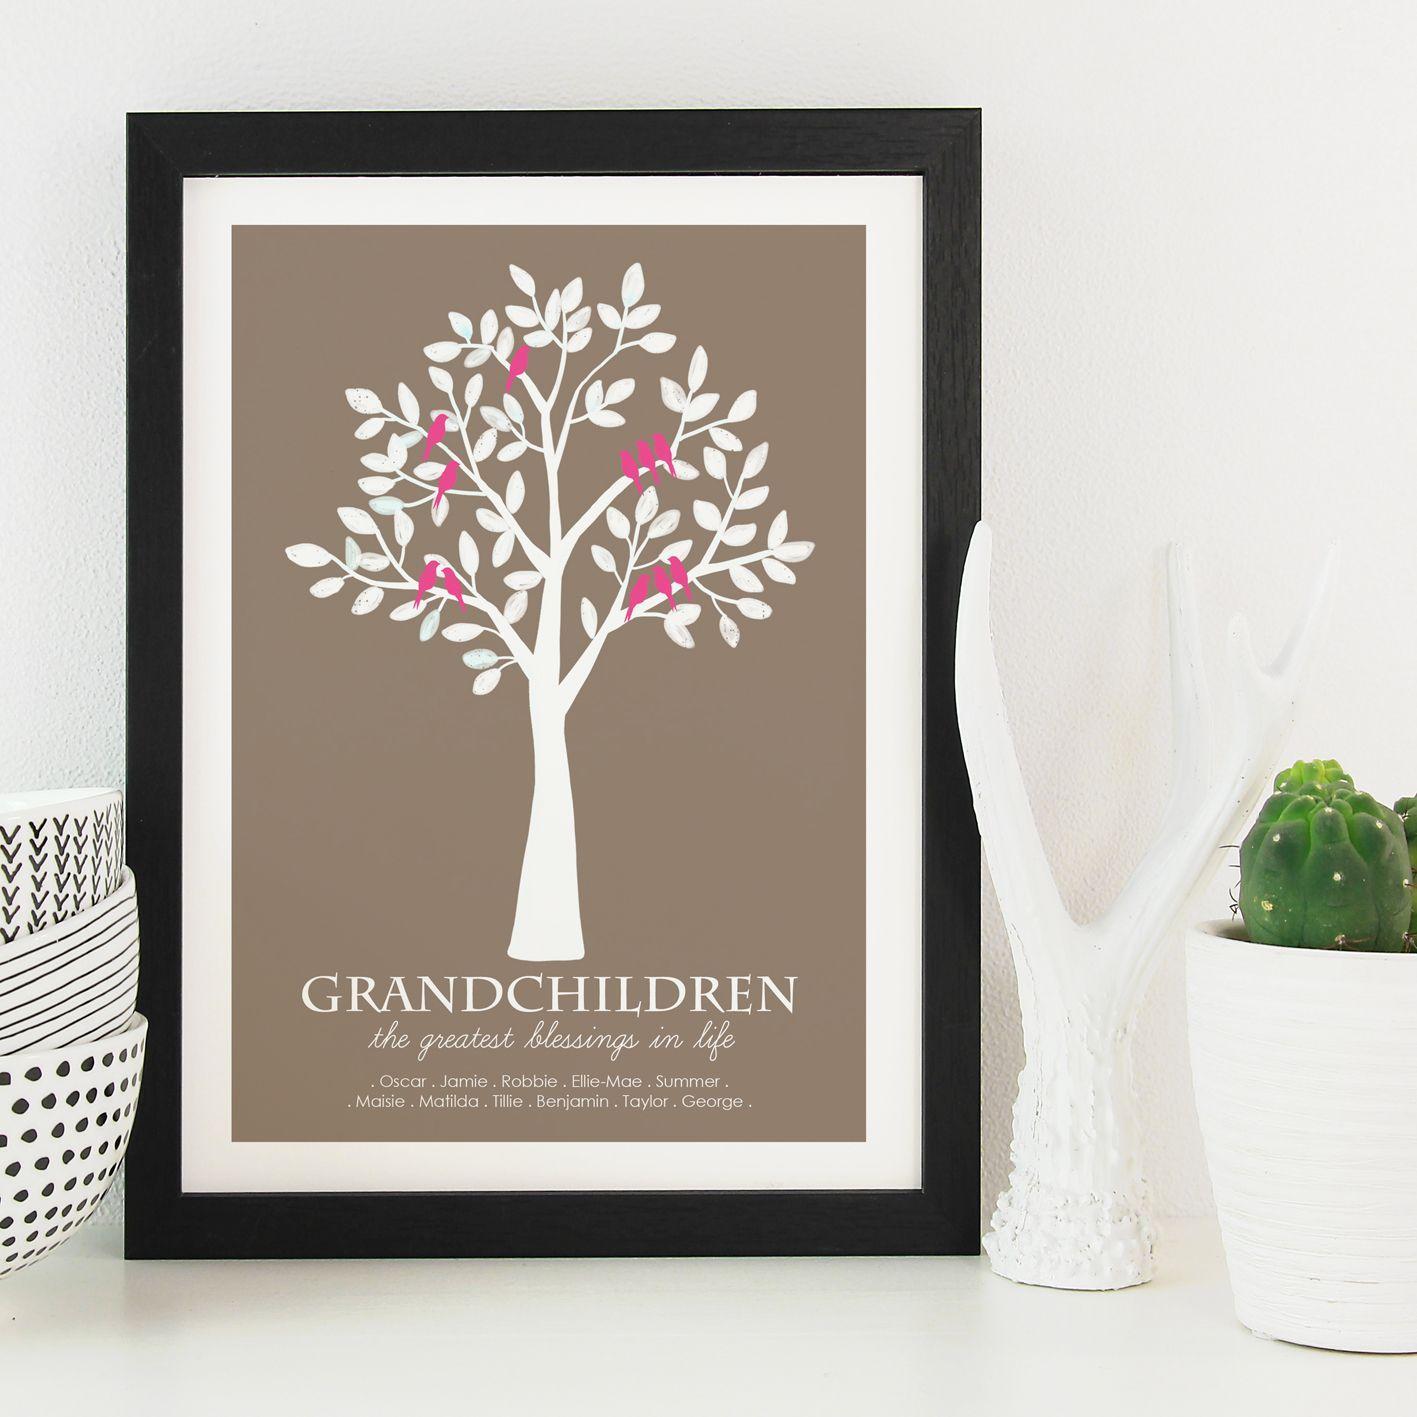 Grandchildren personalised print gift for grandparents